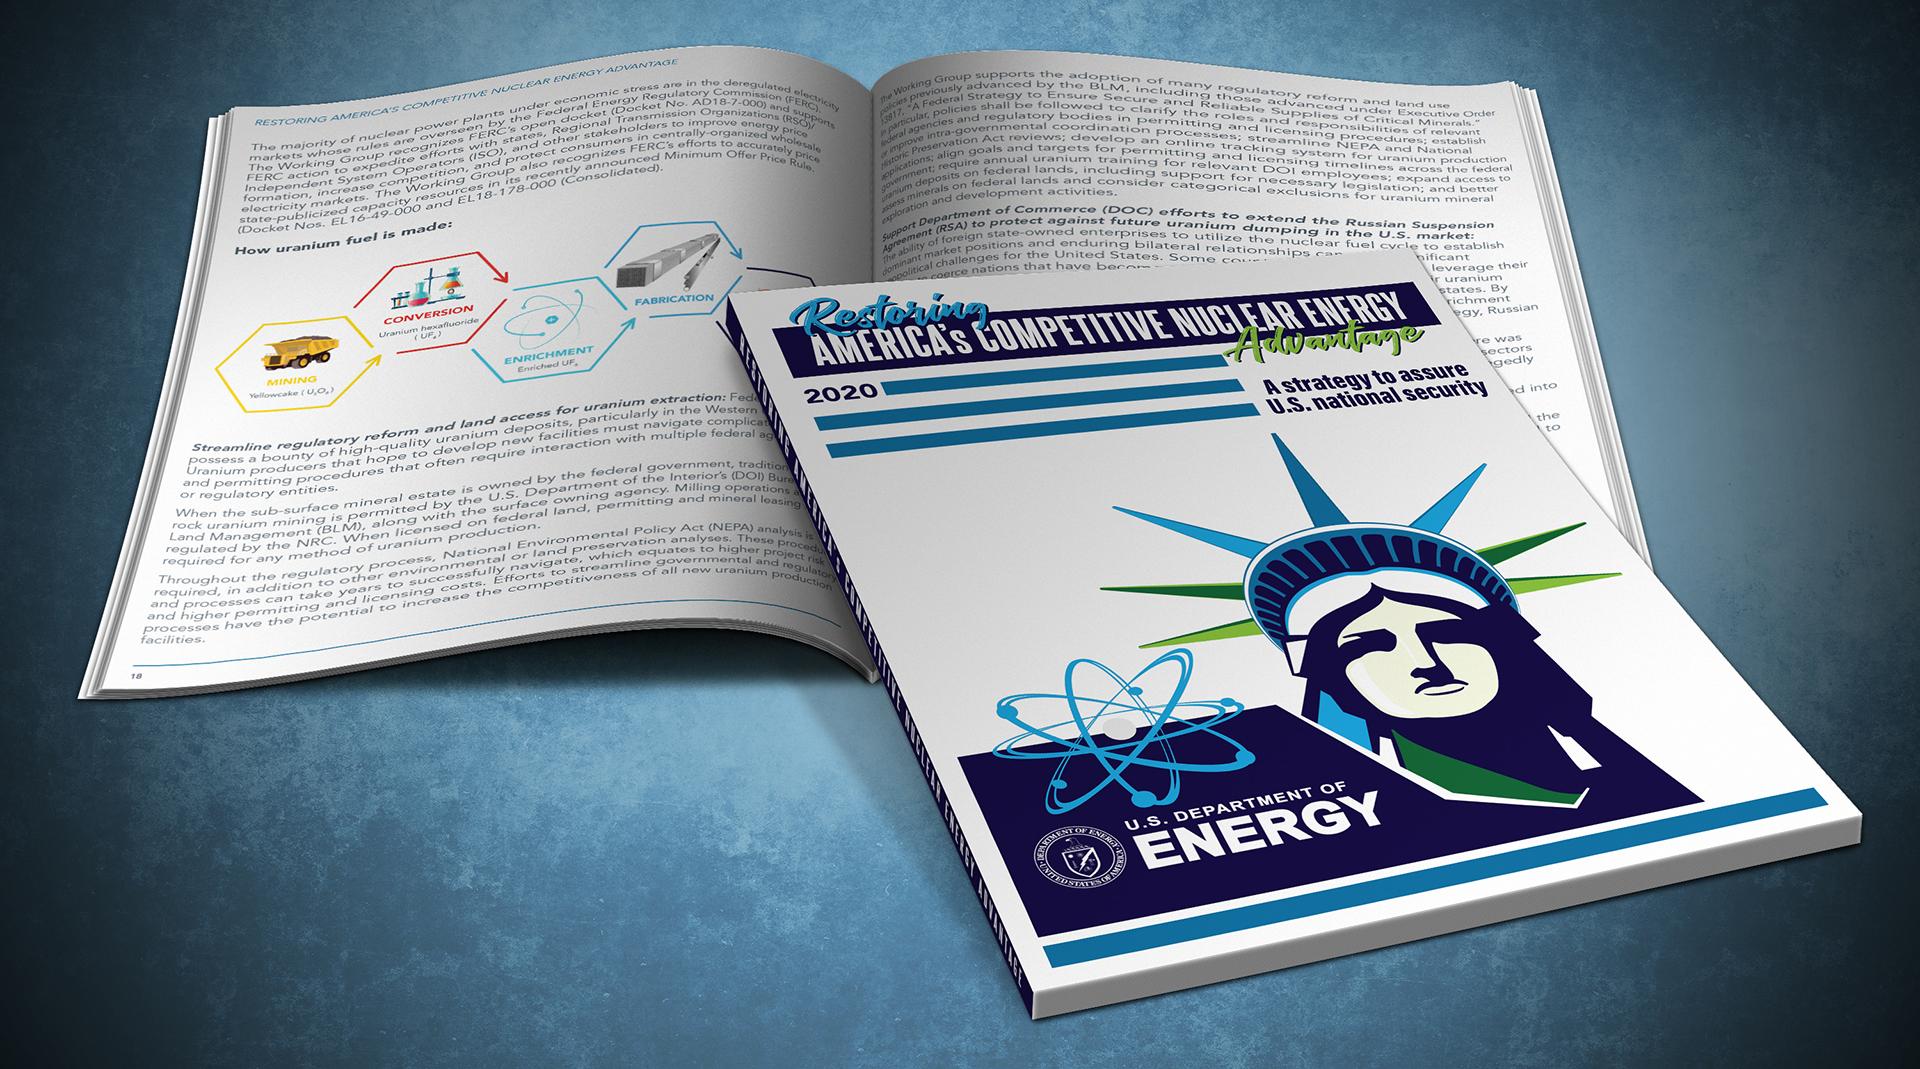 Restoring-Americas-Competitive-Nuclear-Advantage